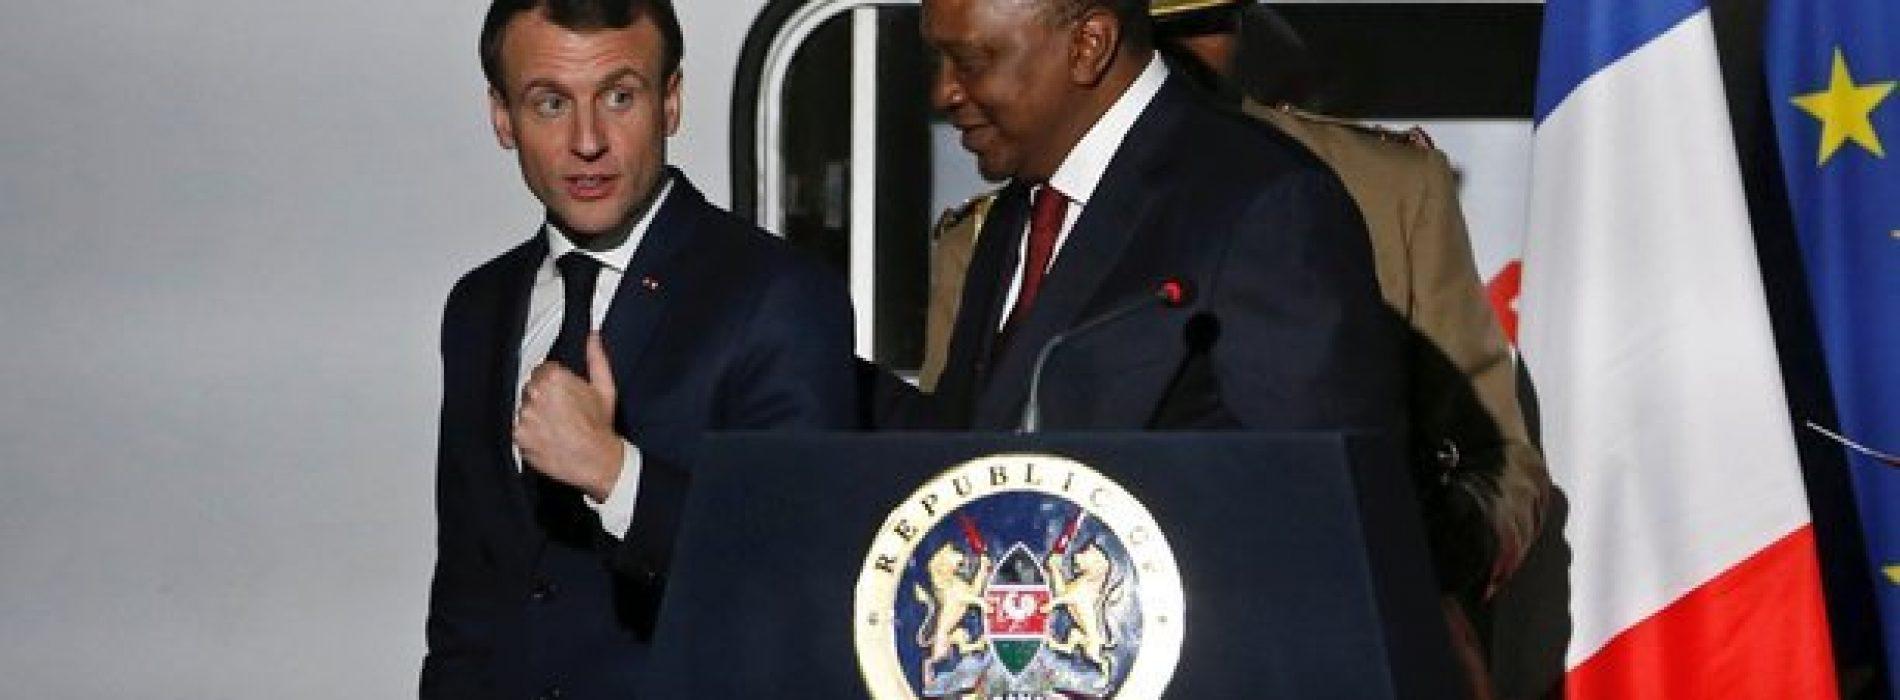 Kenya: Macron riceve il presidente del Kenya per la firma di tre contratti